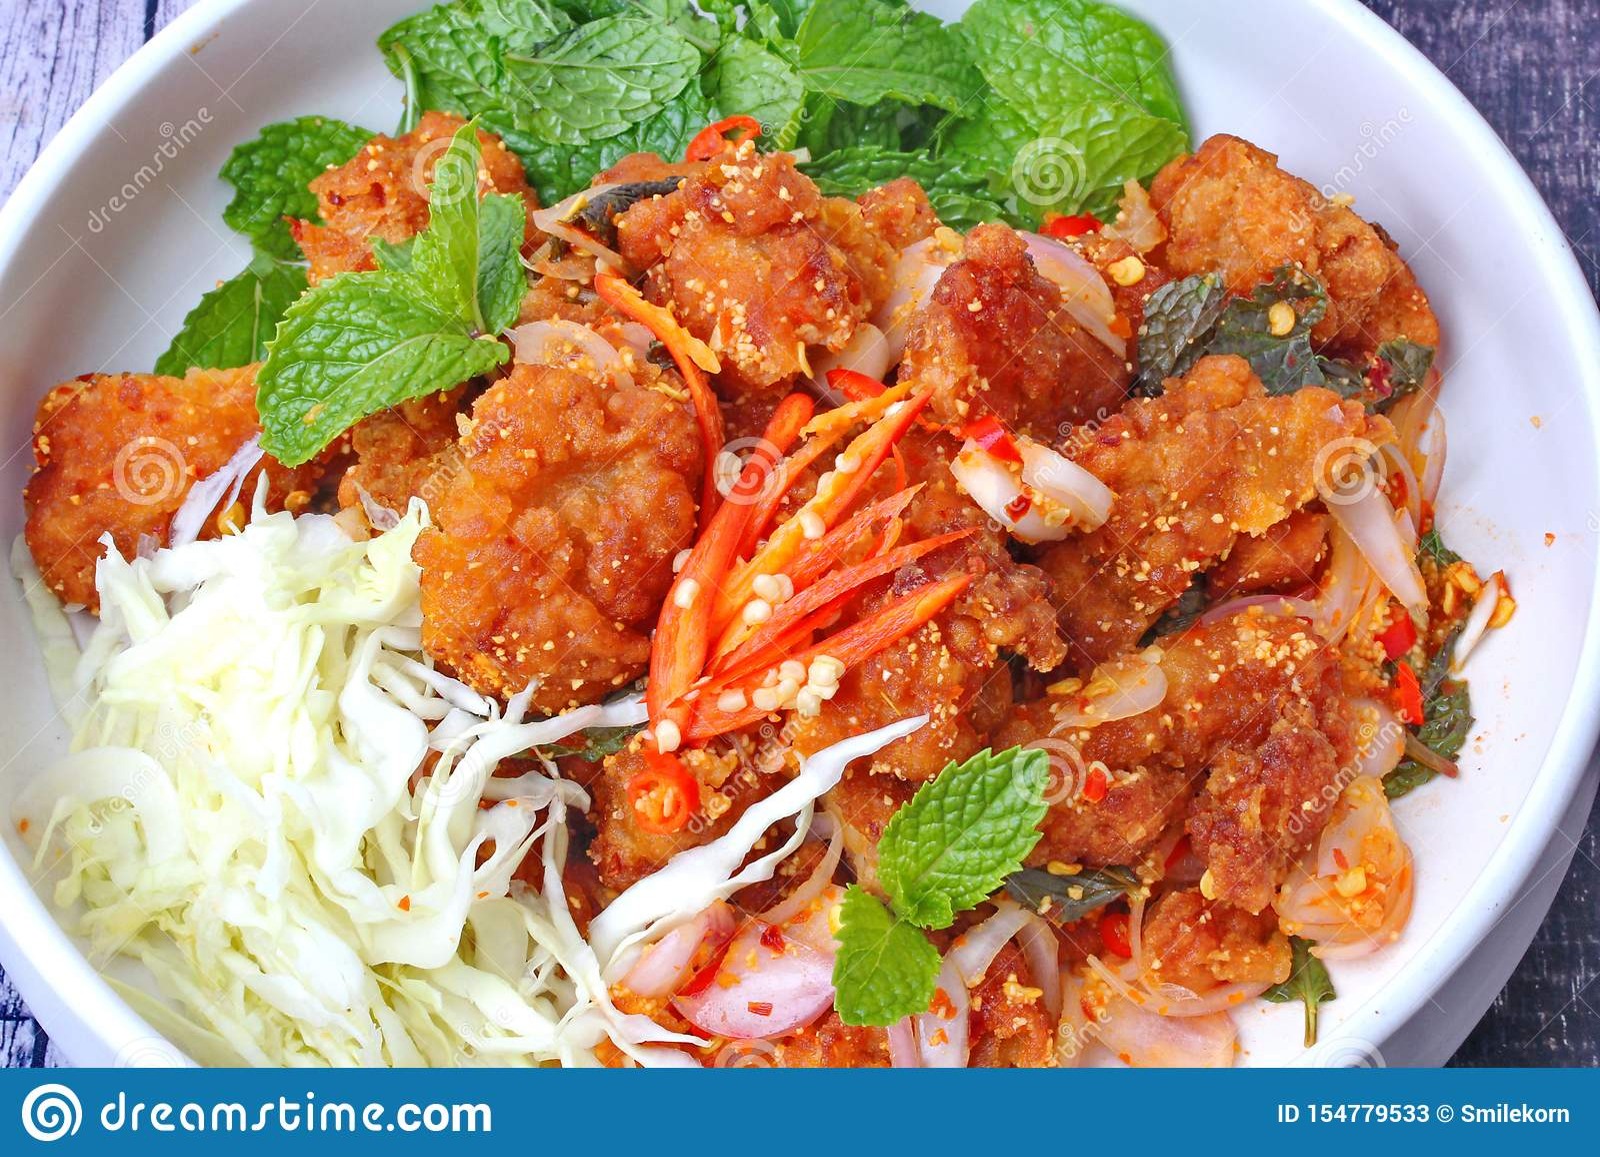 Thai Food Spicy Crispy Deep Fried Chicken Salad Stock Image Image Of Crispy Fried 154779533